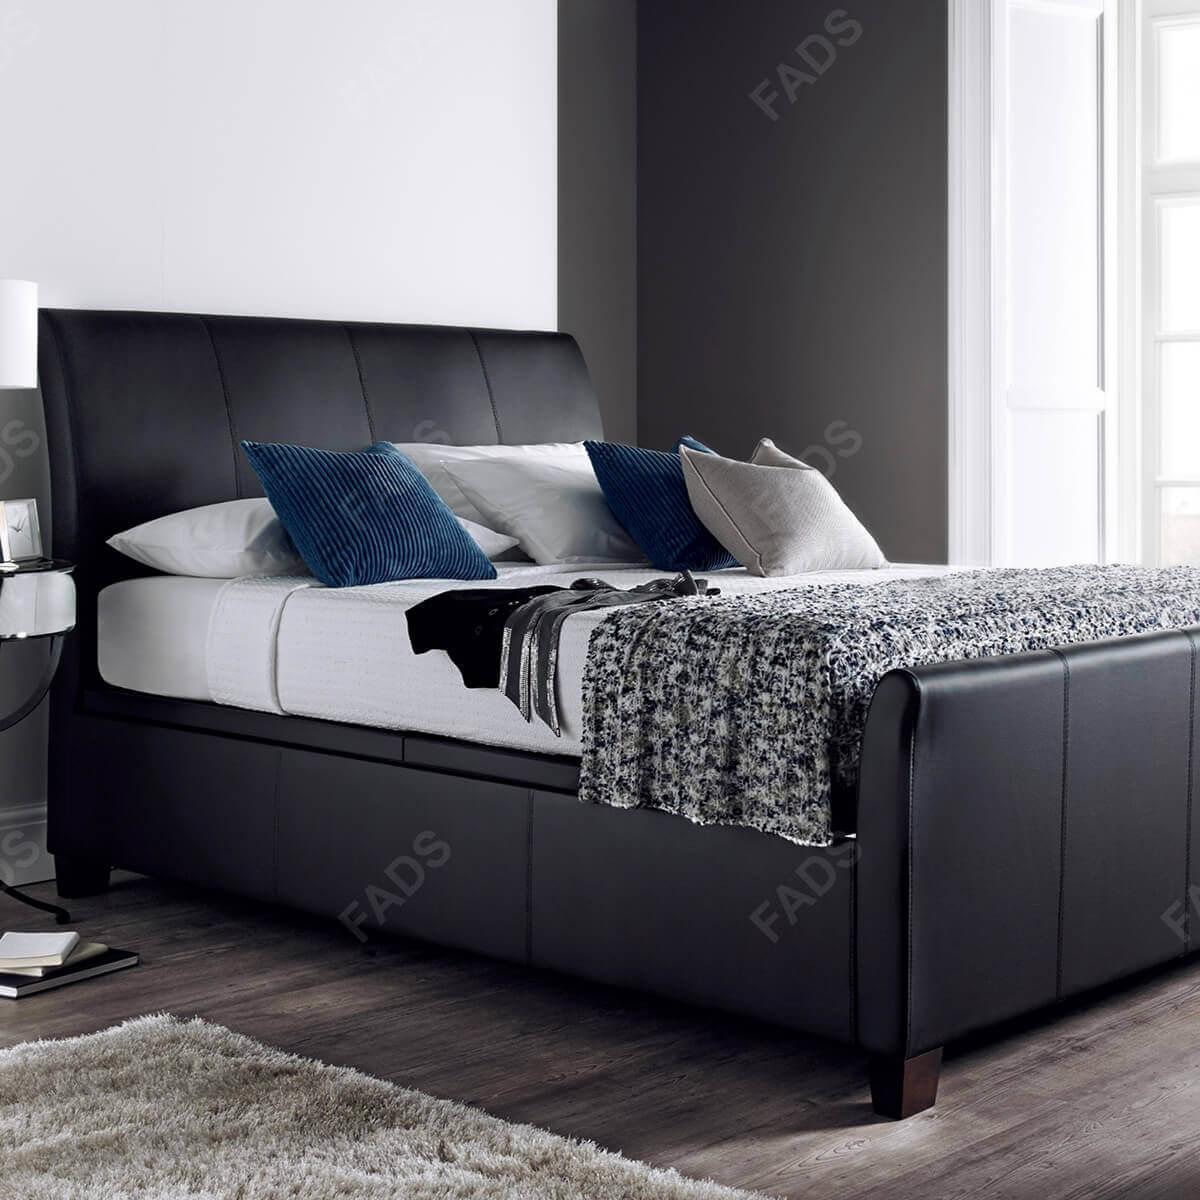 Kaydian Allendale Ottoman Bed Black Bonded Leather 2